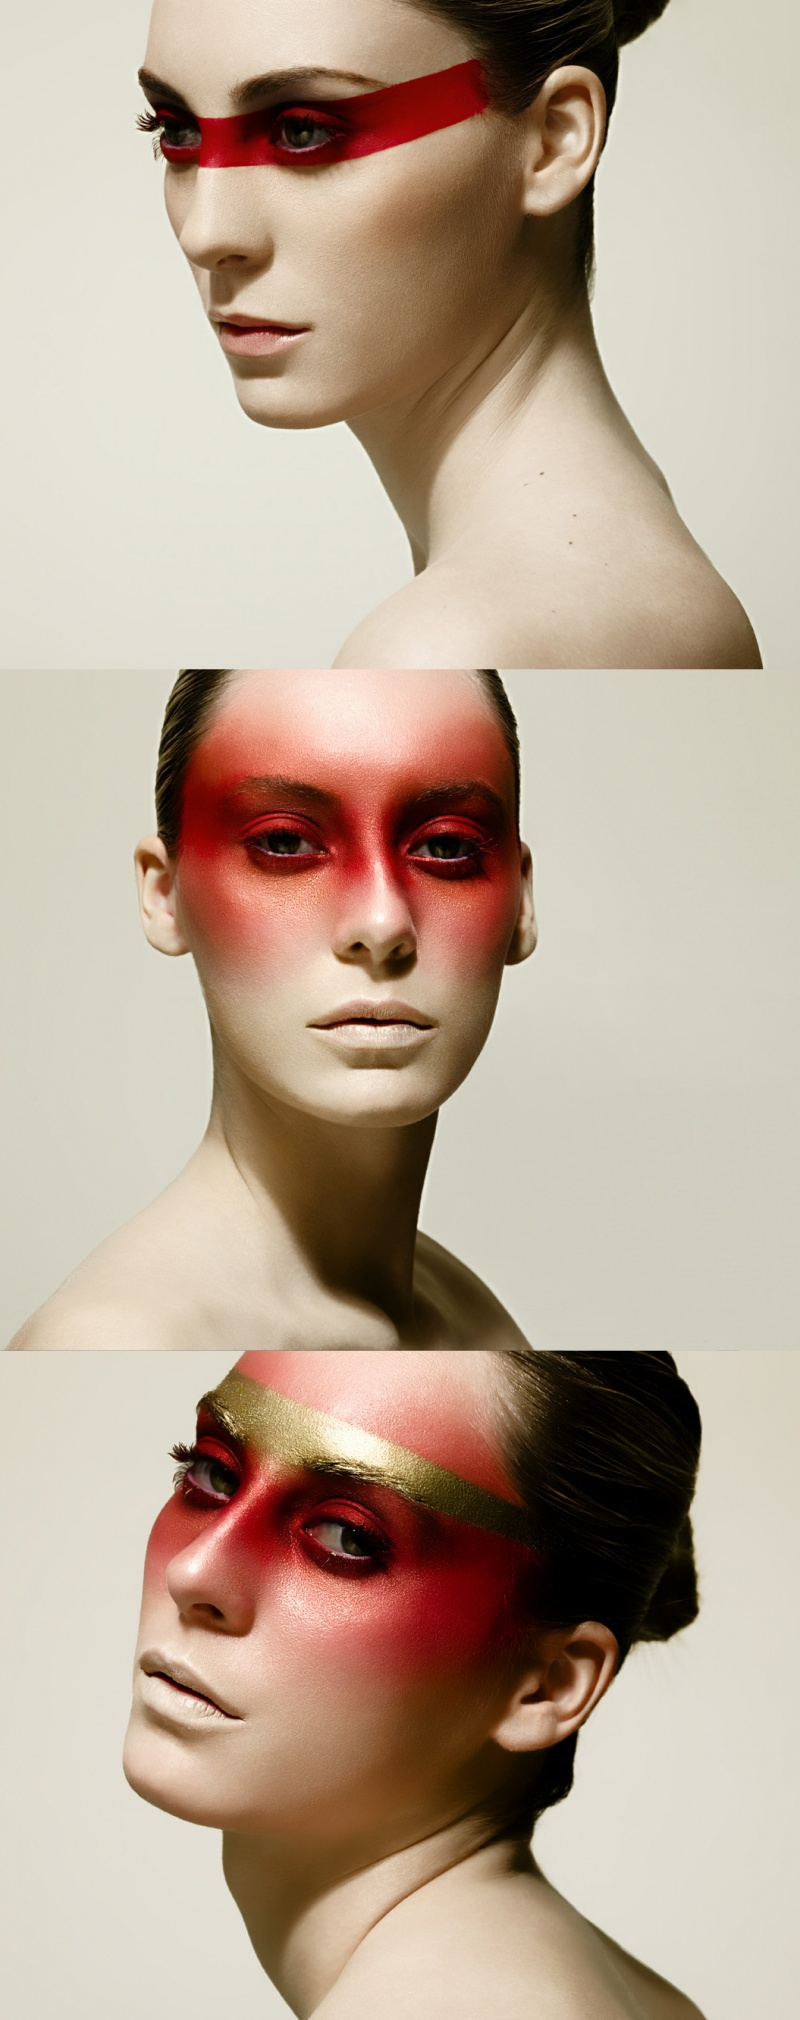 Female model photo shoot of make up with erica in Paris ooh la la!